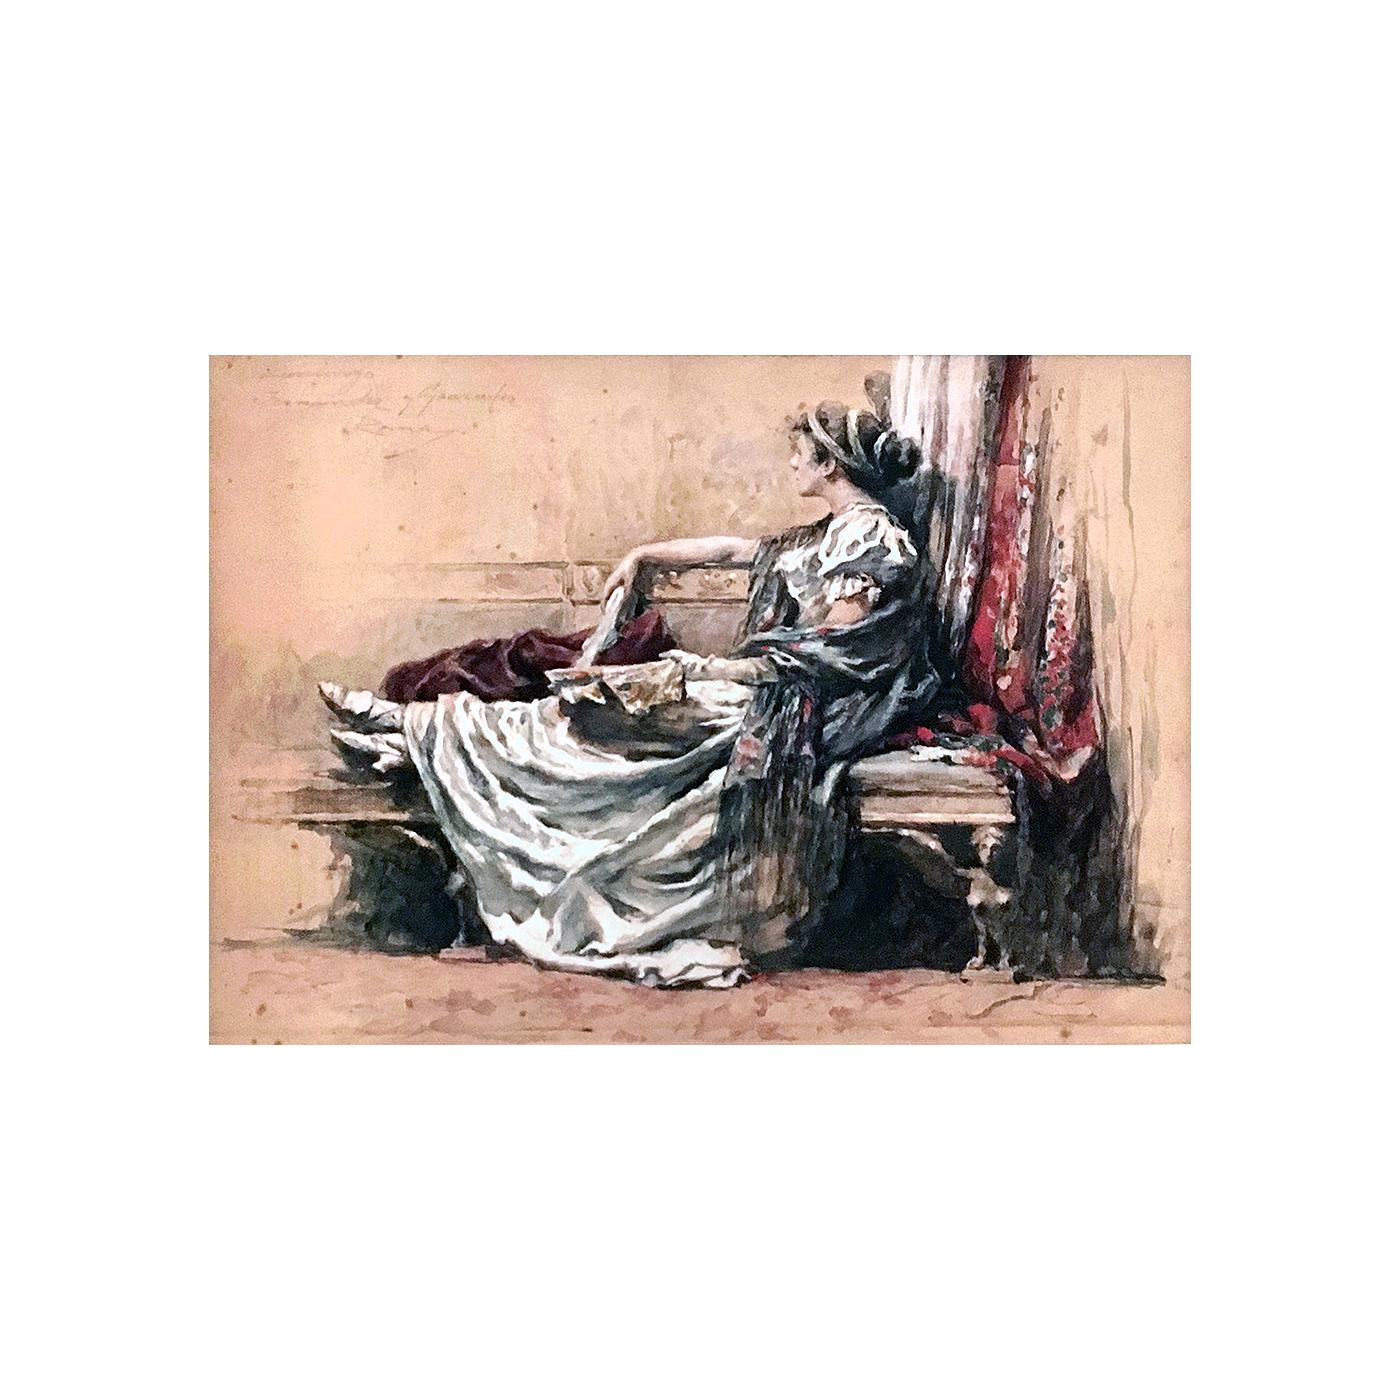 "Domingo Fernandez Y Gonzalez [1862-ca.1918] Spanish ""Classical beauty, Rome"", ca.1890."